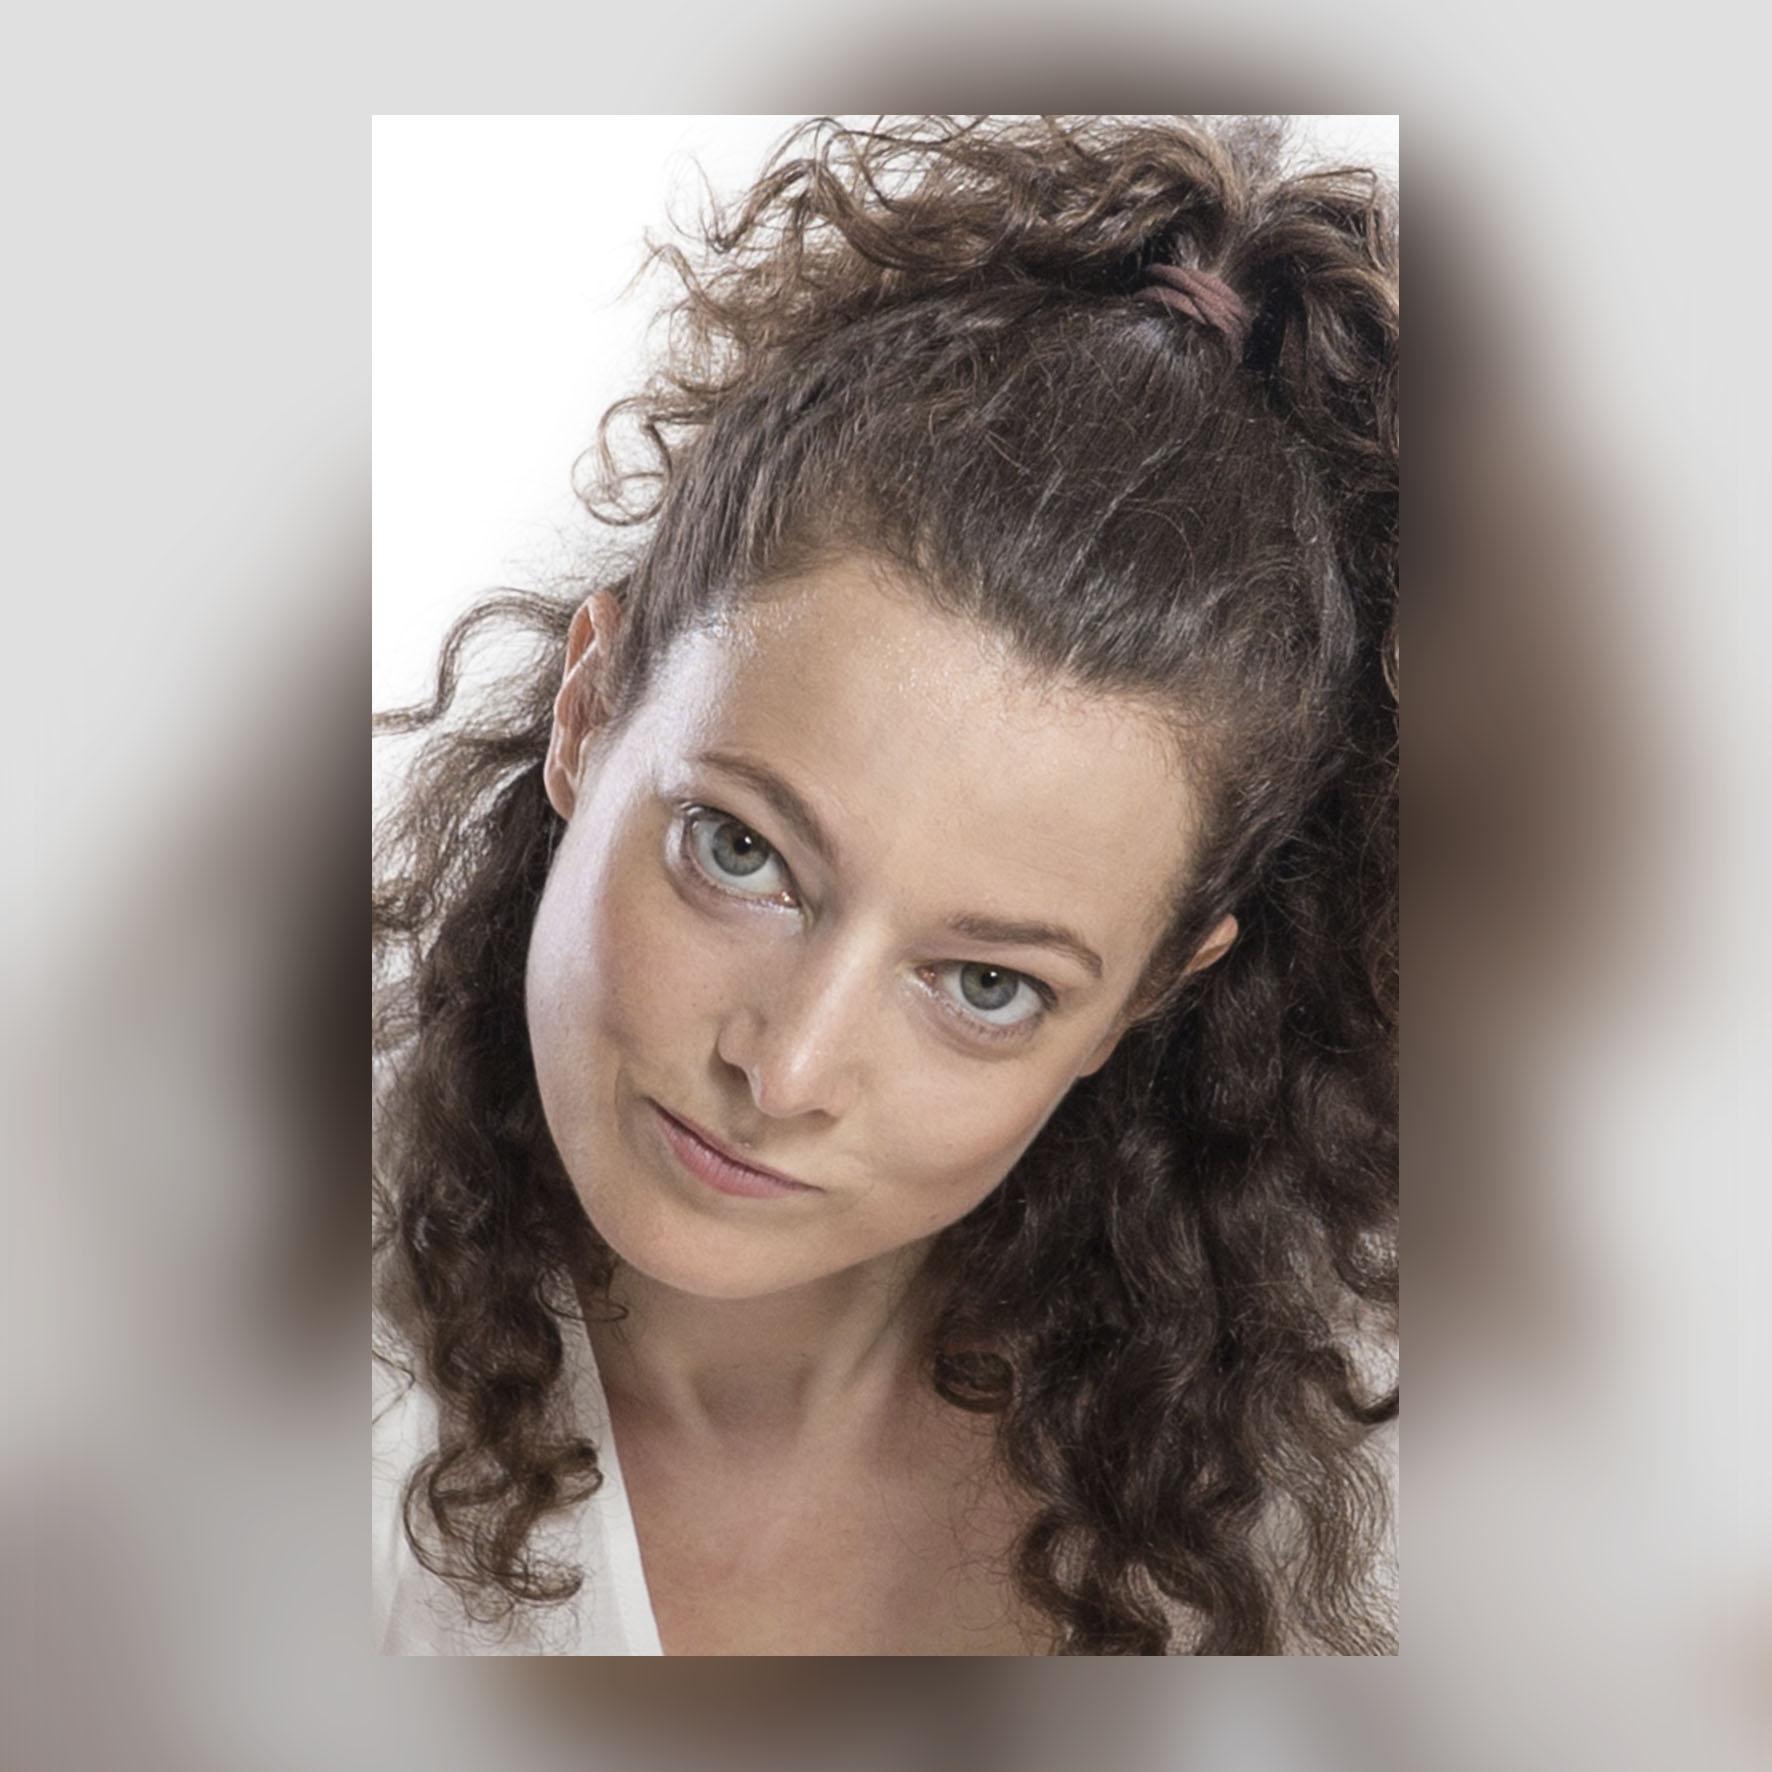 Ursula Geef